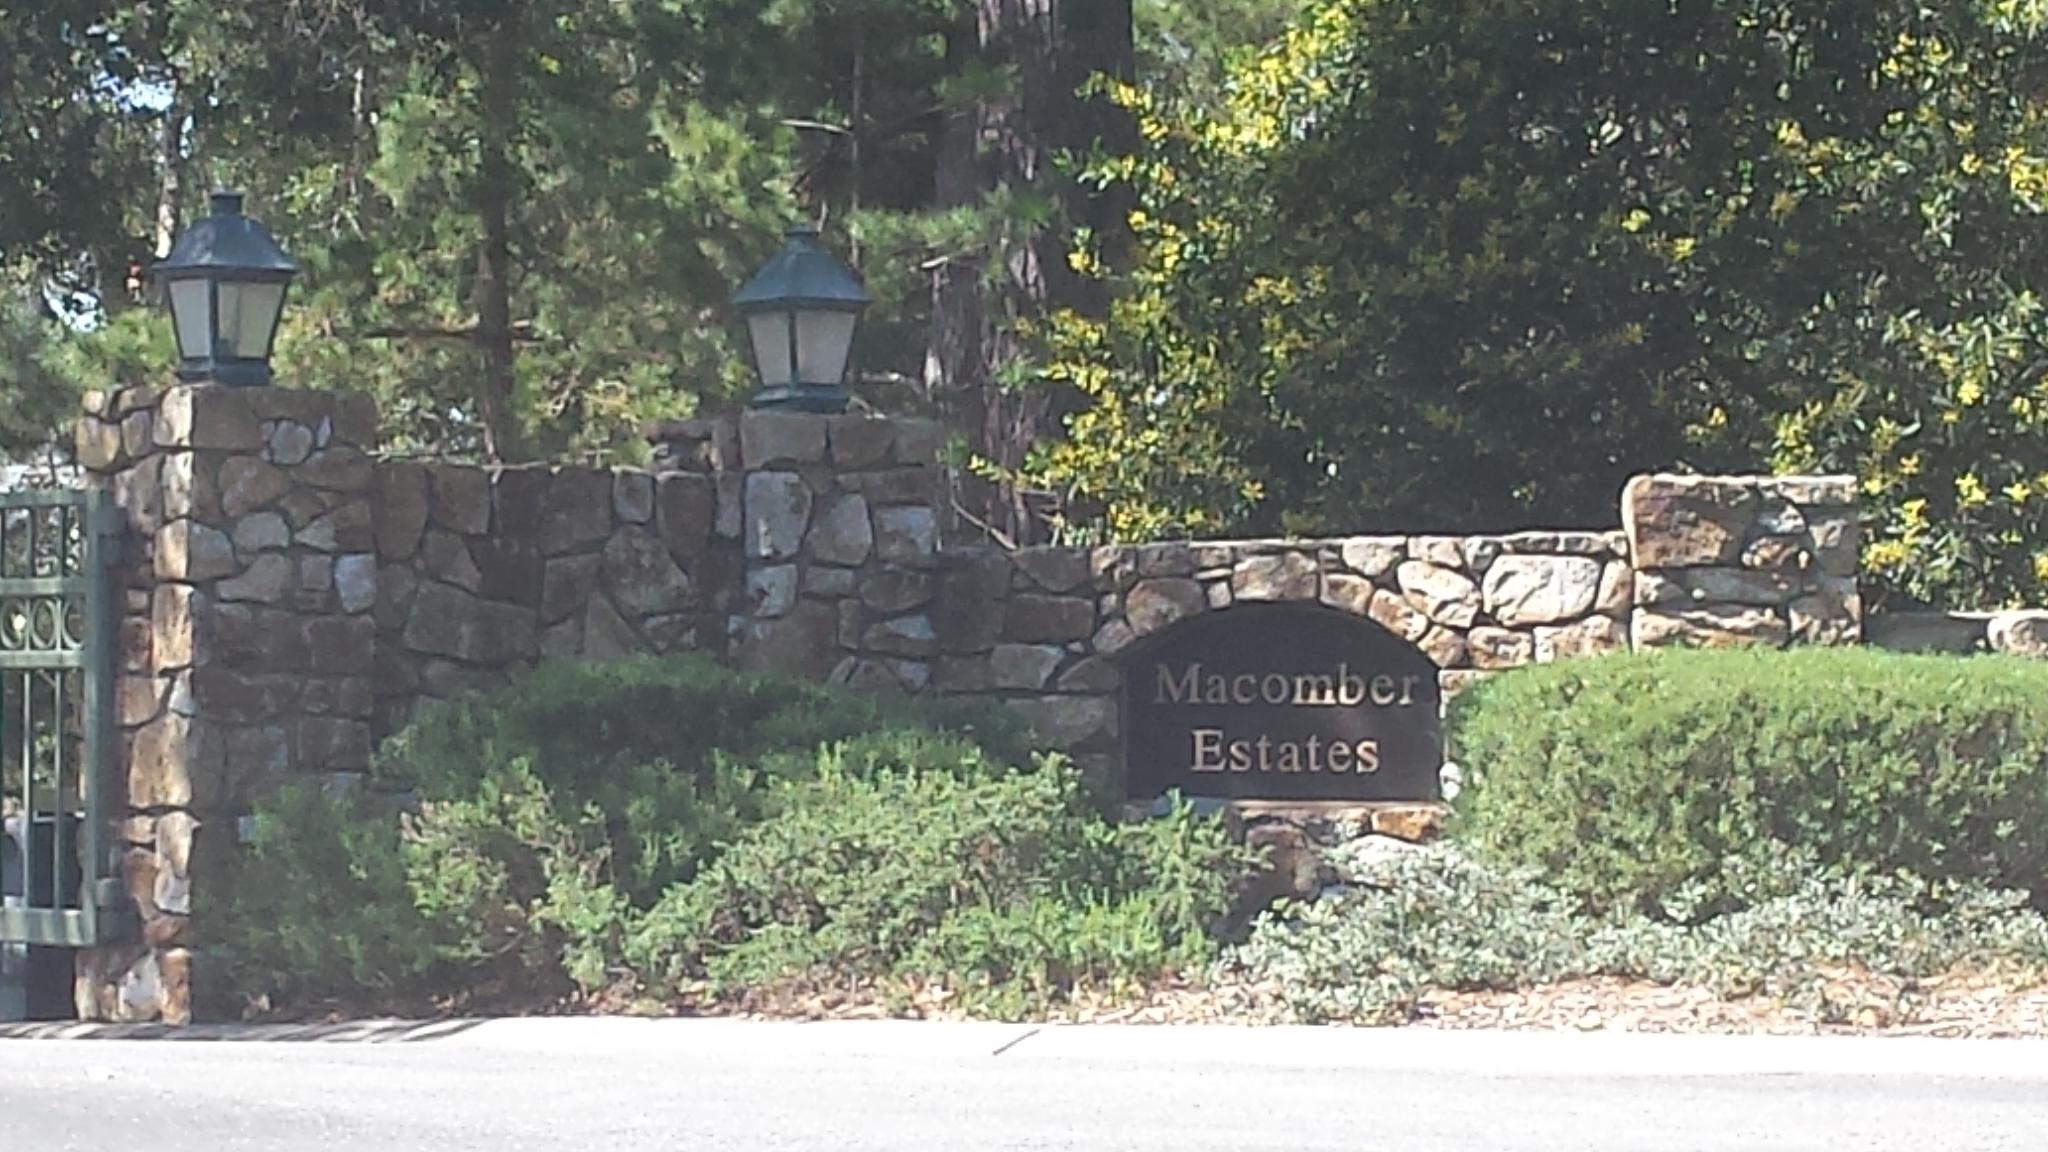 macomber estates